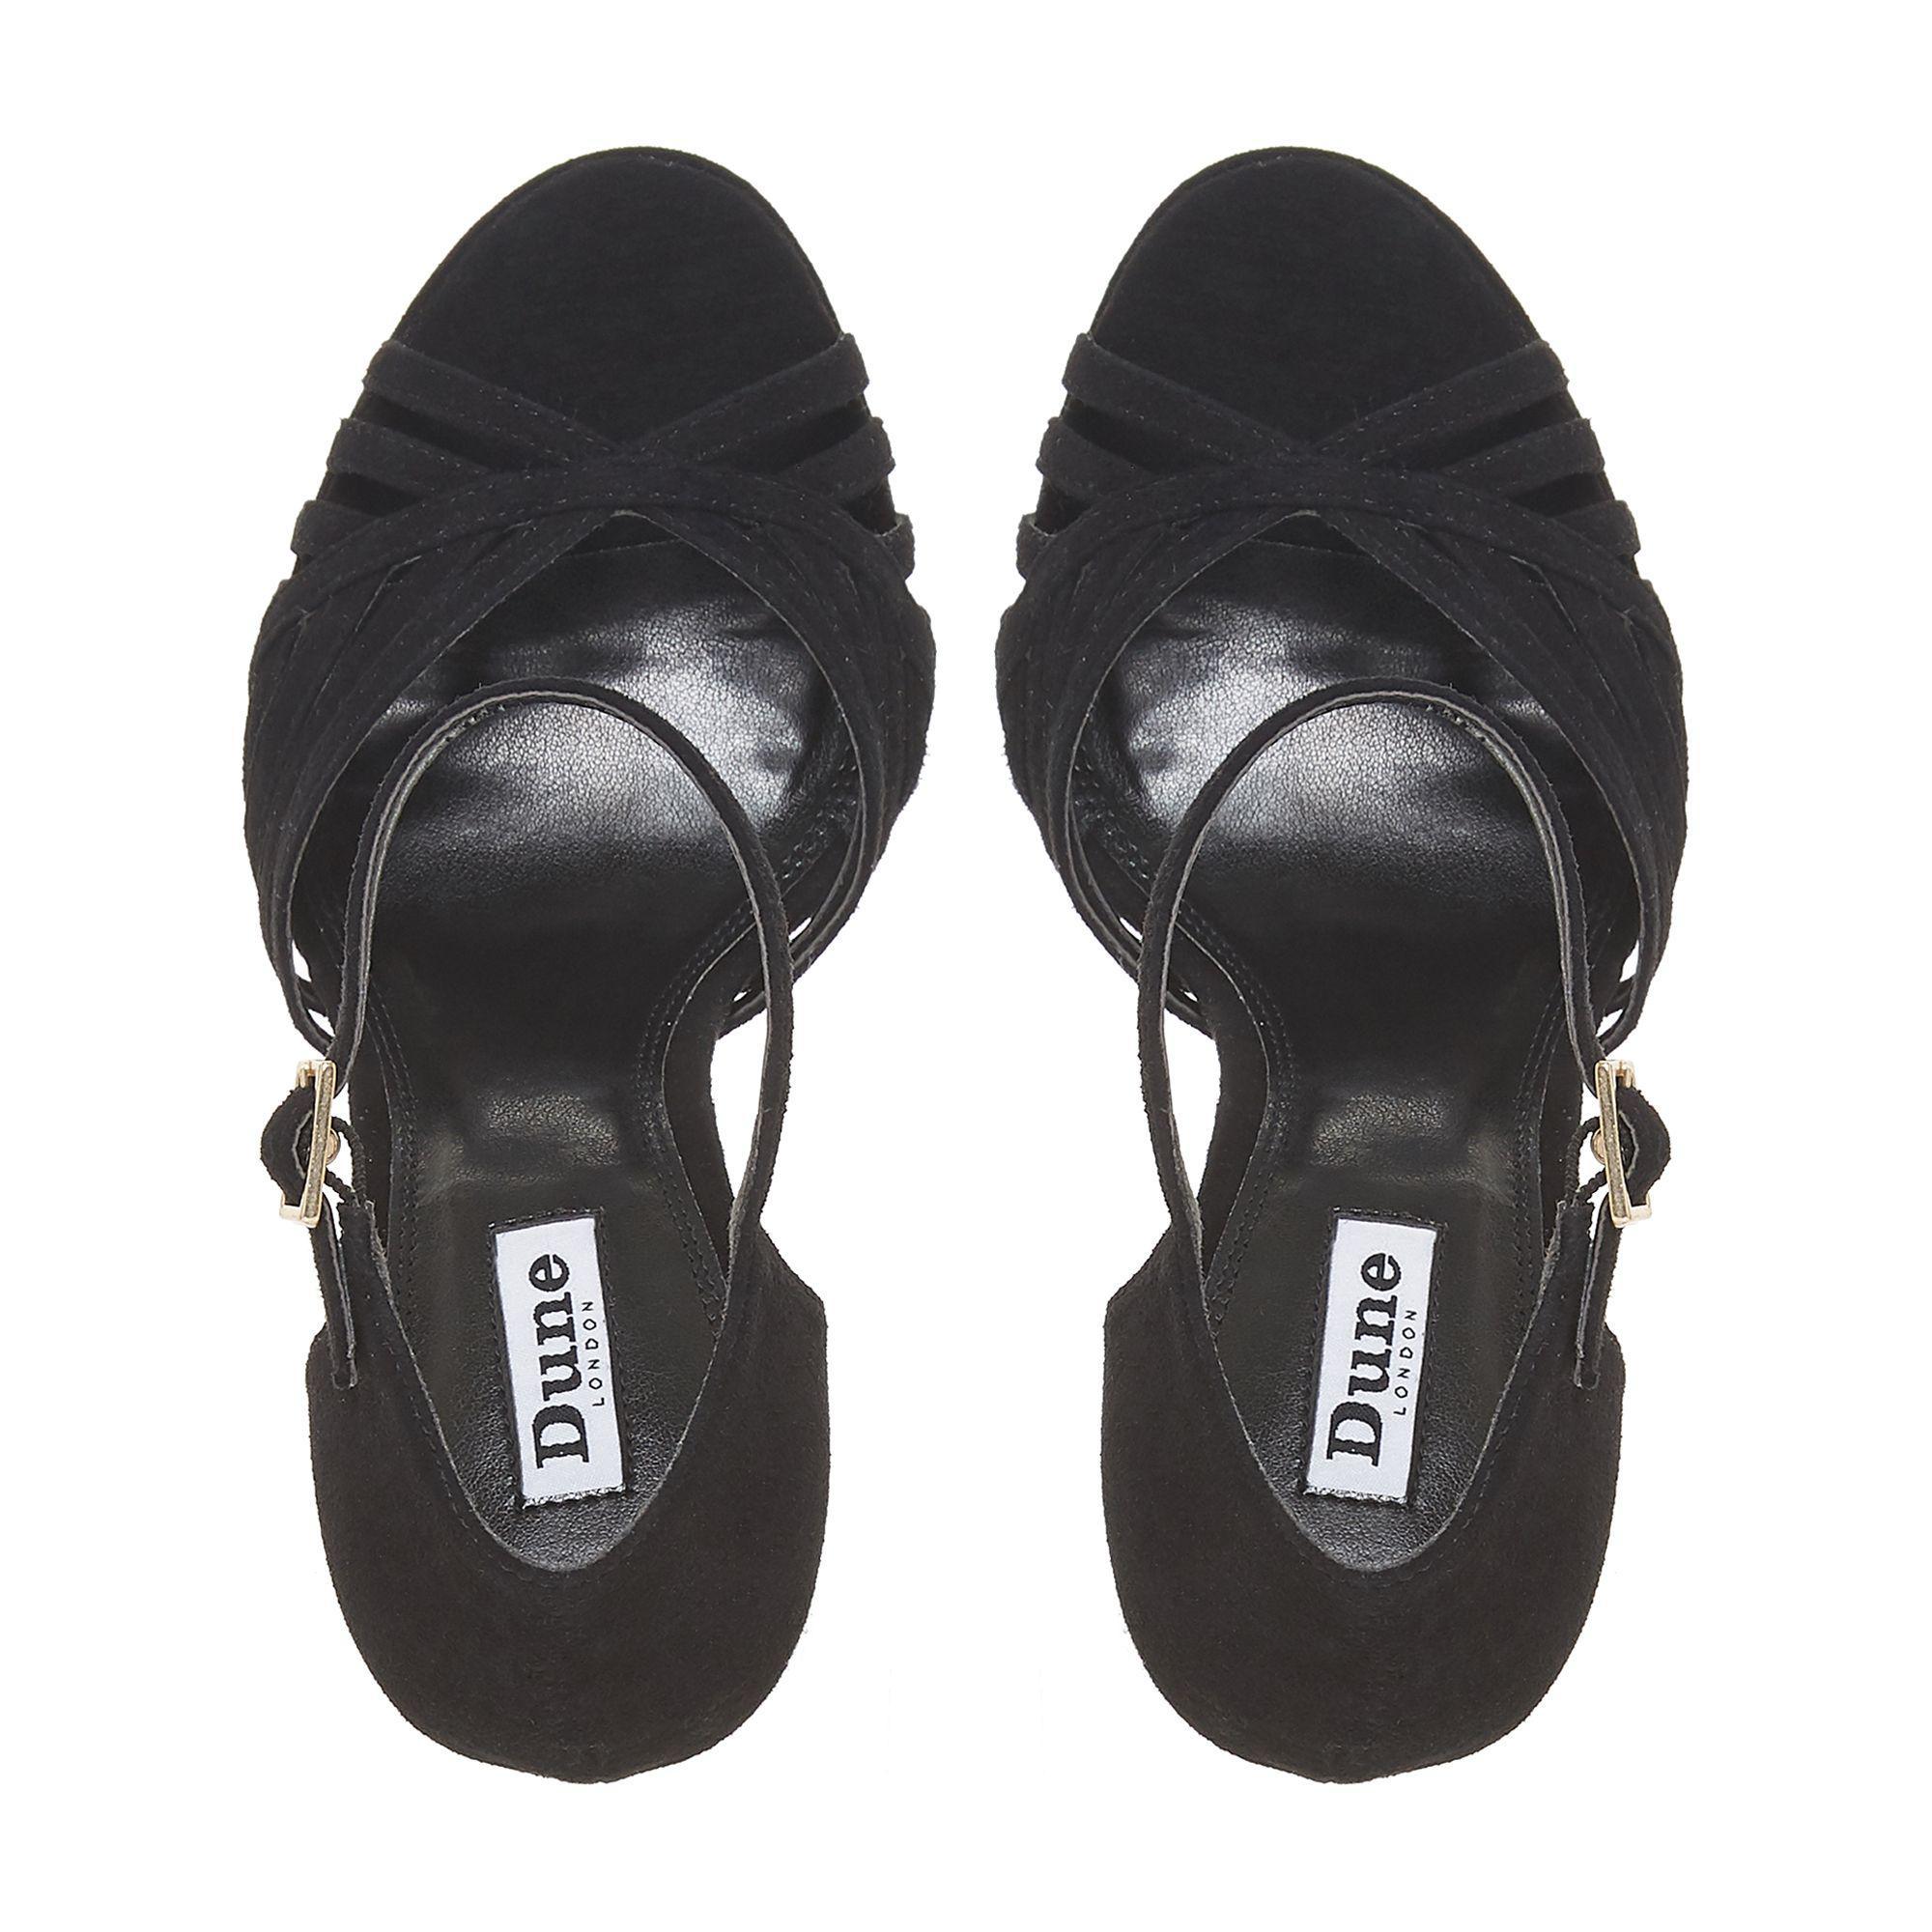 10e9dc9e2e5 Dune Black Suede  madisonn  High Platform Ankle Strap Sandals in ...